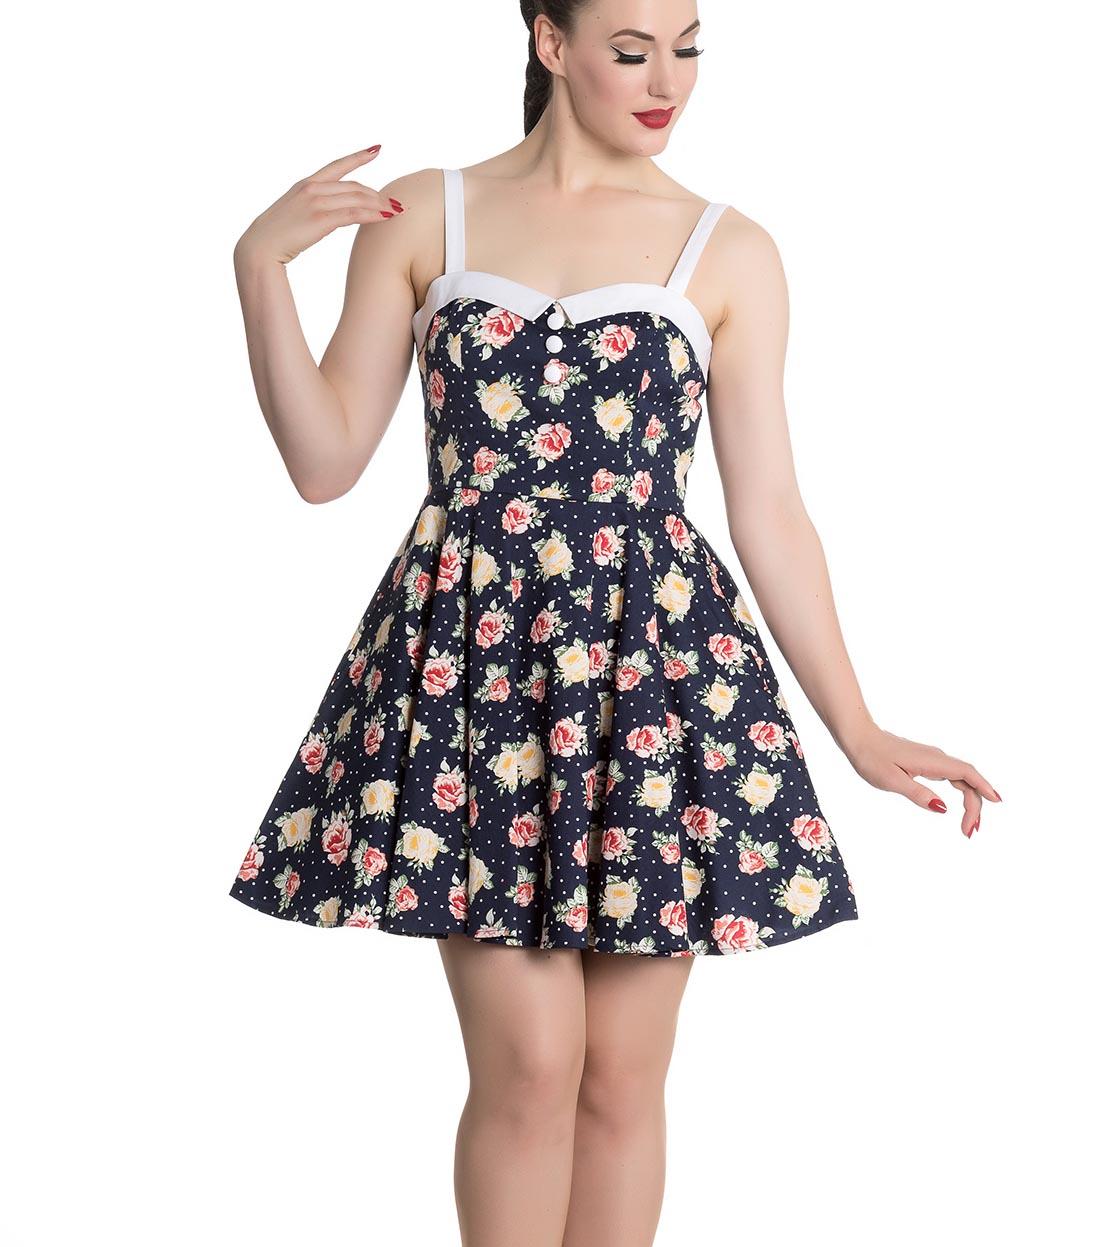 Hell-Bunny-Navy-Blue-Floral-Roses-Flowers-Mini-Dress-EMMA-Polka-Dot-All-Sizes thumbnail 7